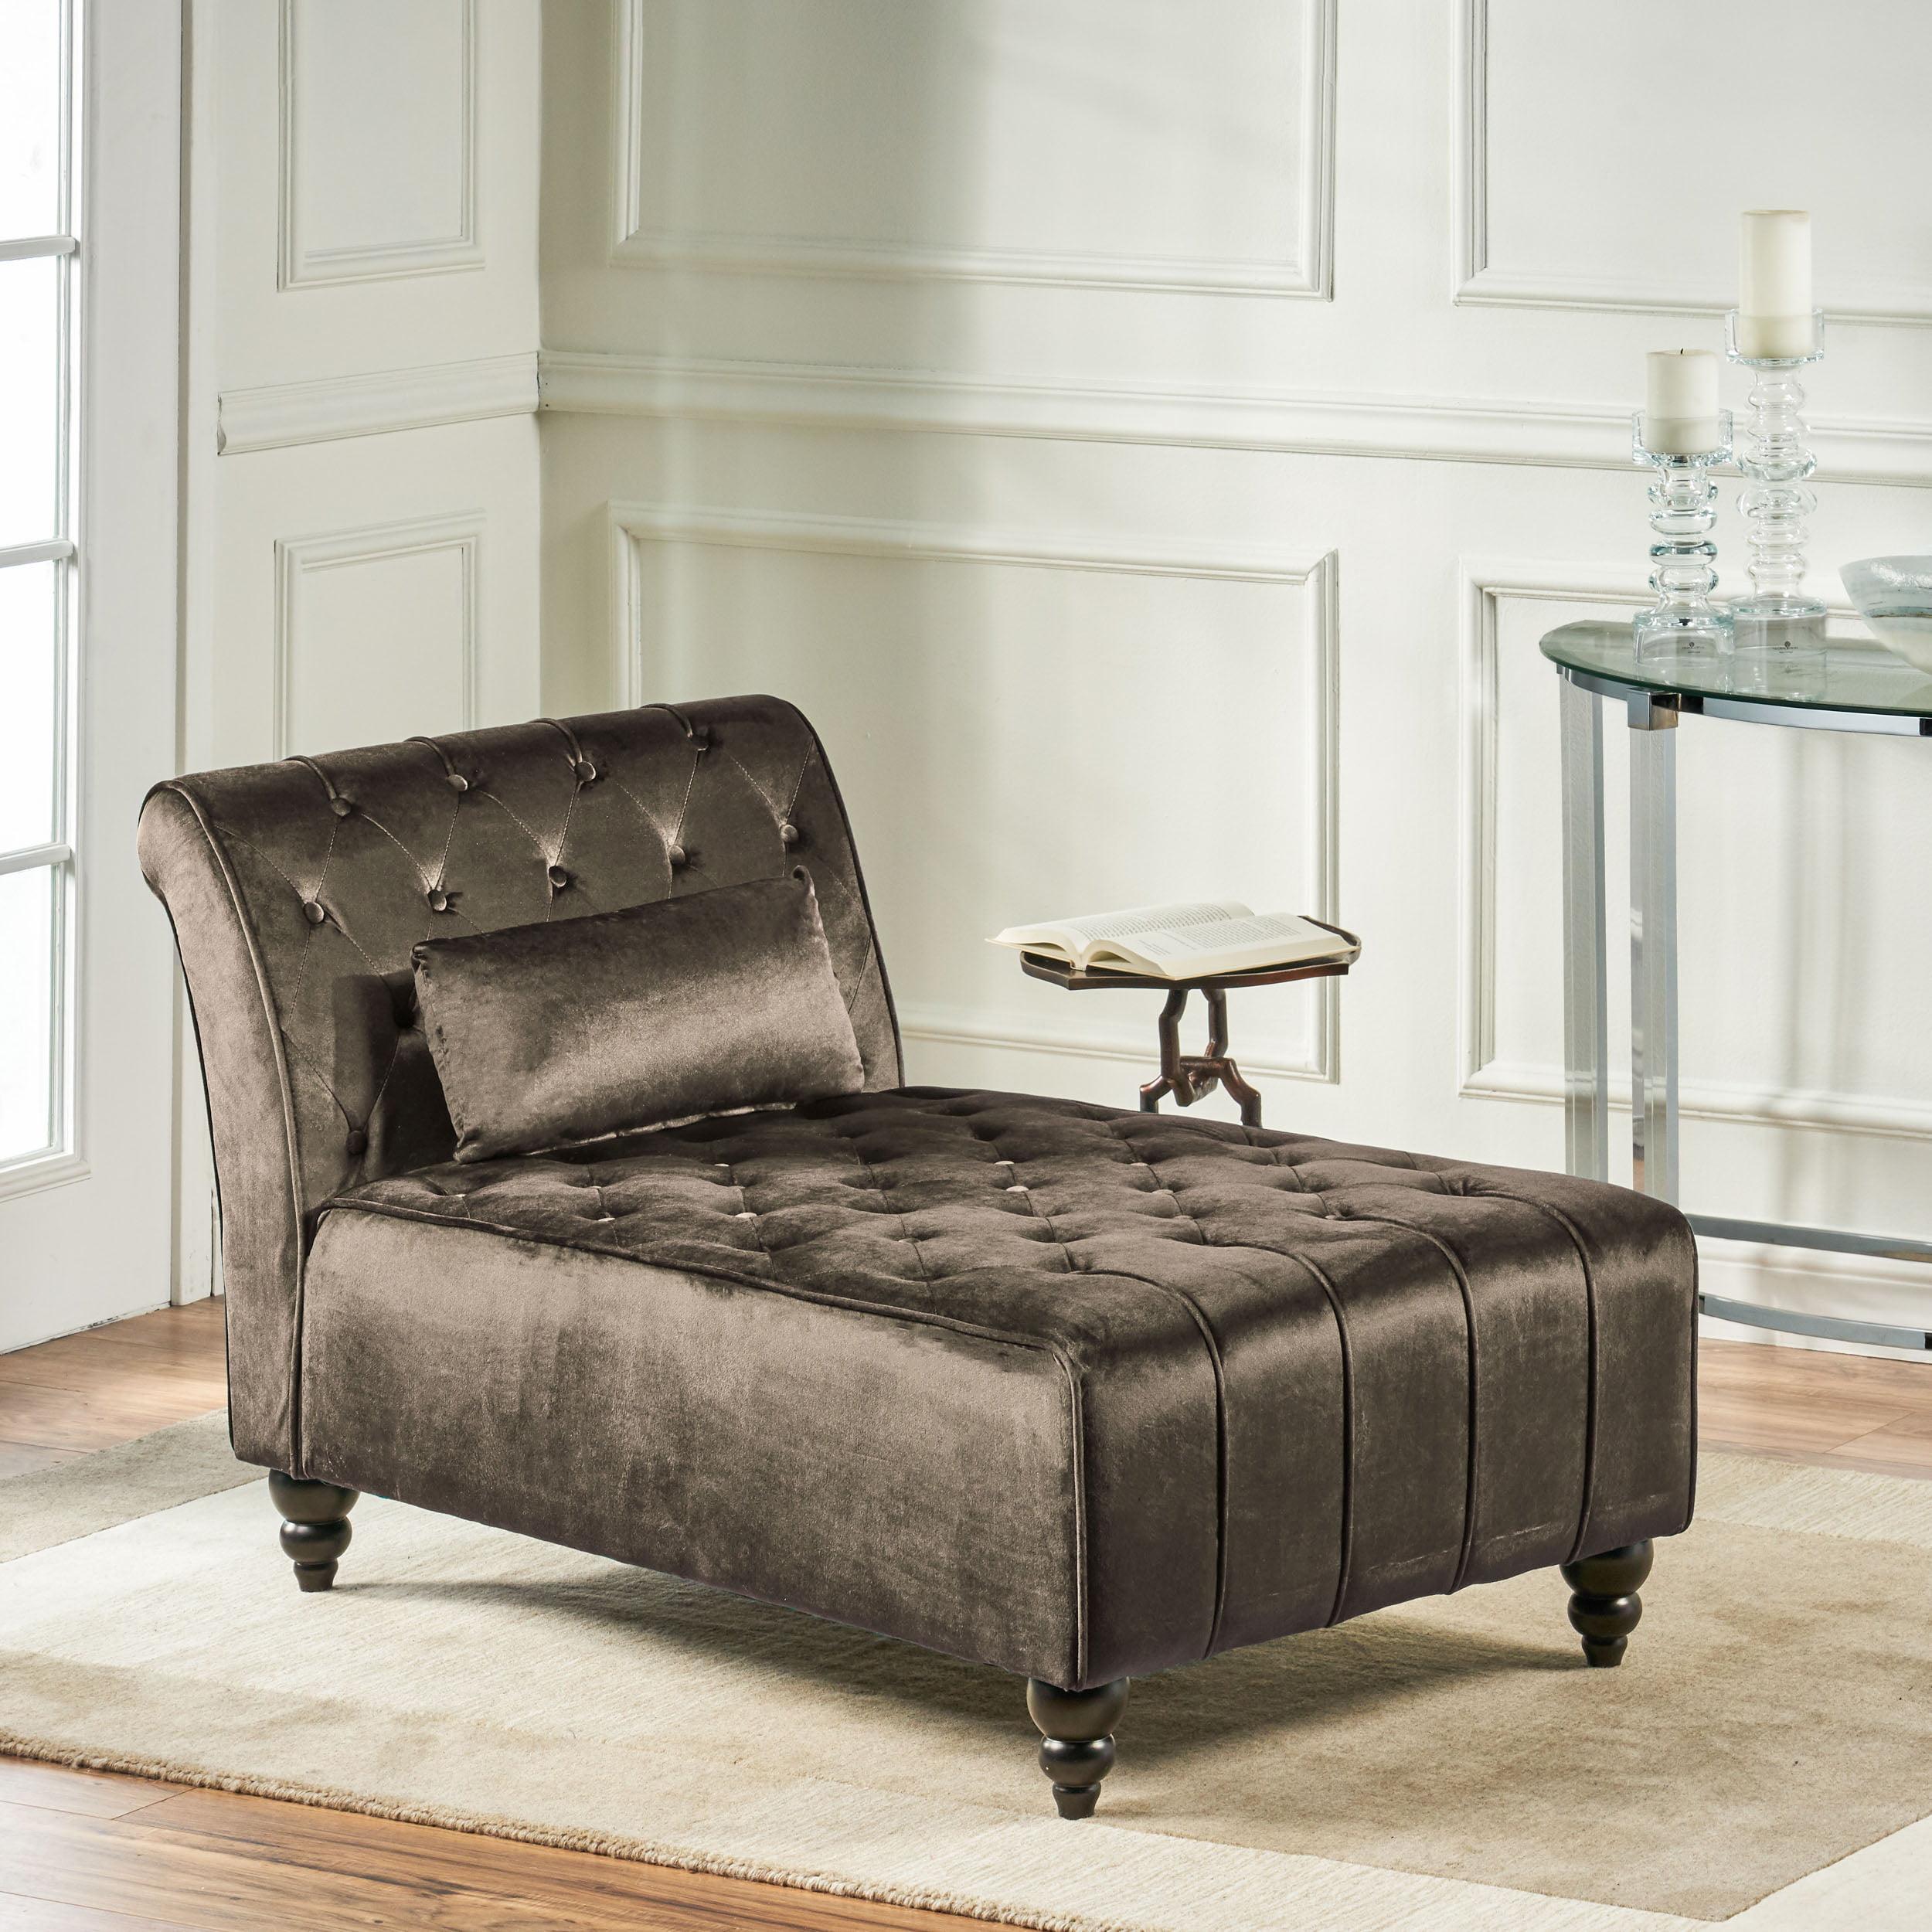 Rafaela Modern Glam Tufted Velvet Chaise Lounge With Scrolled Backrest Gray And Dark Brown Walmart Com Walmart Com